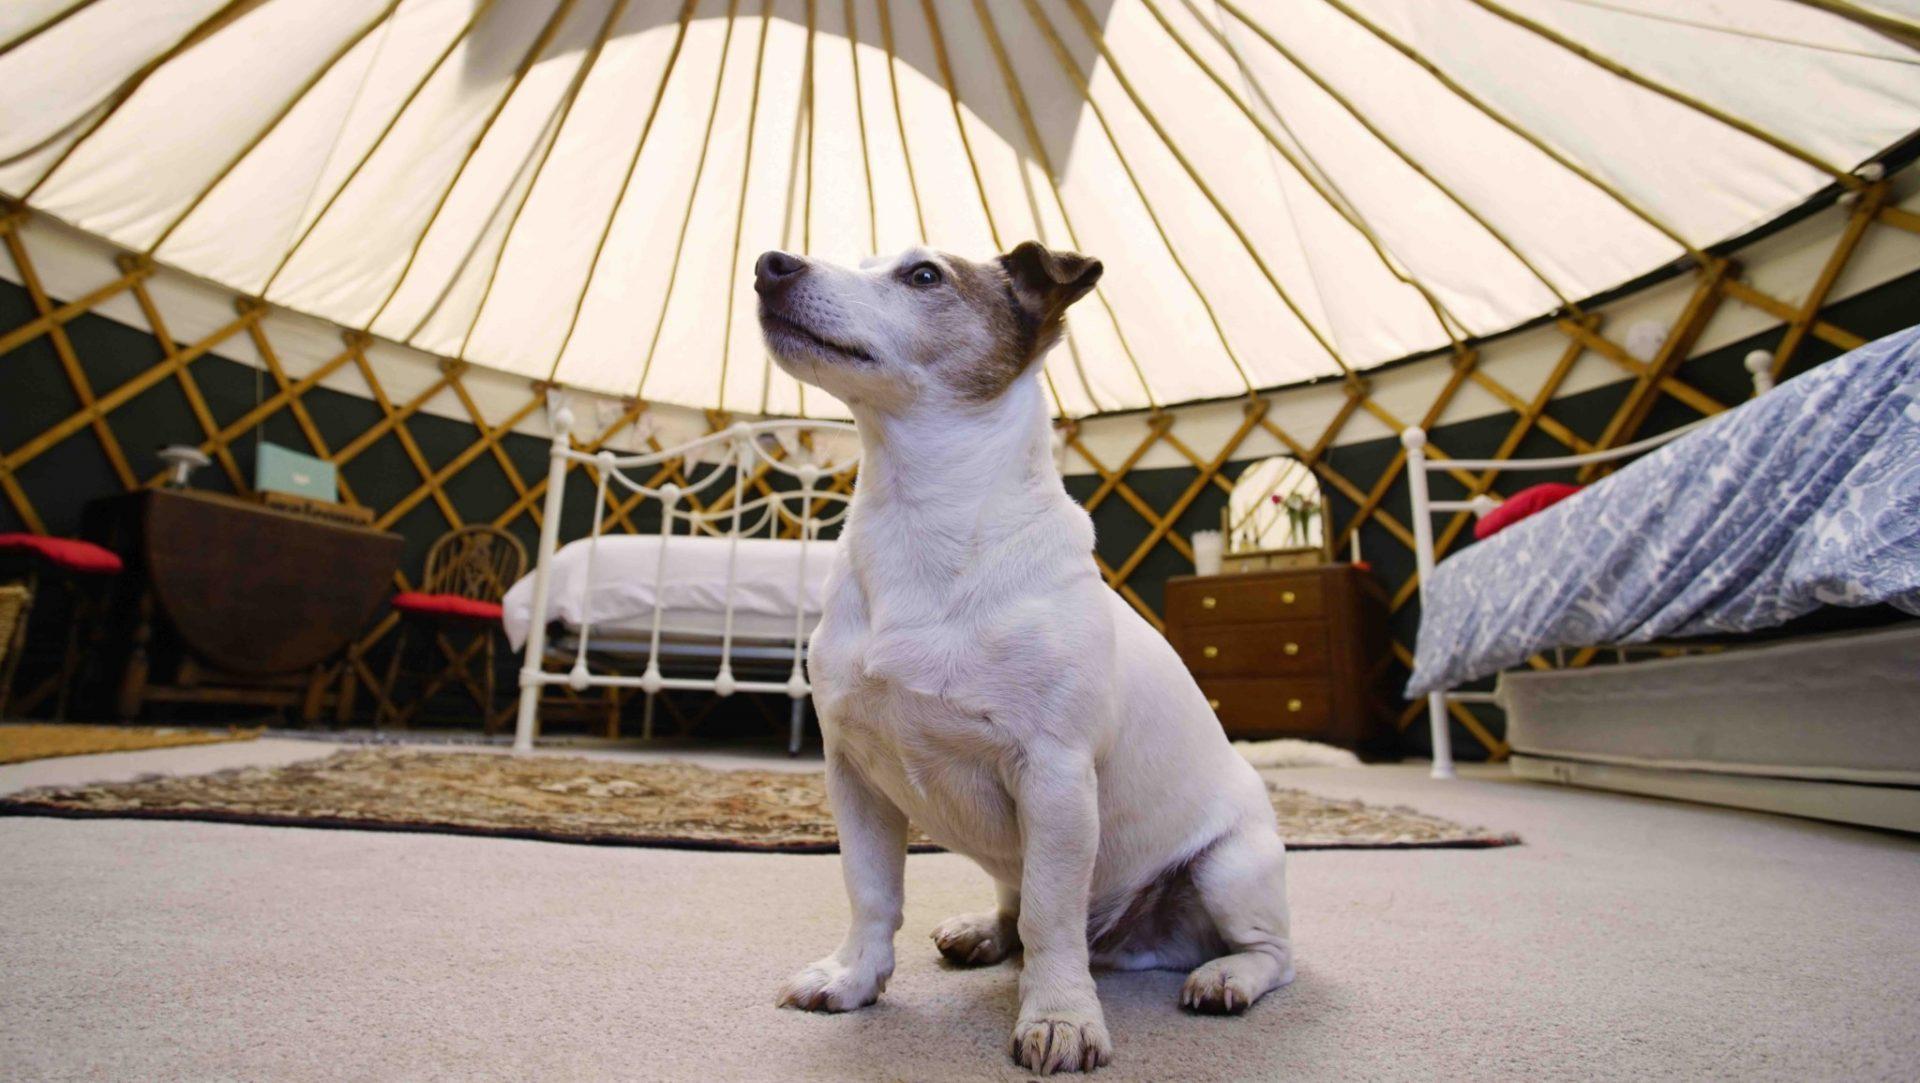 Summer, fun & Moon Dog | The Orchard Retreat